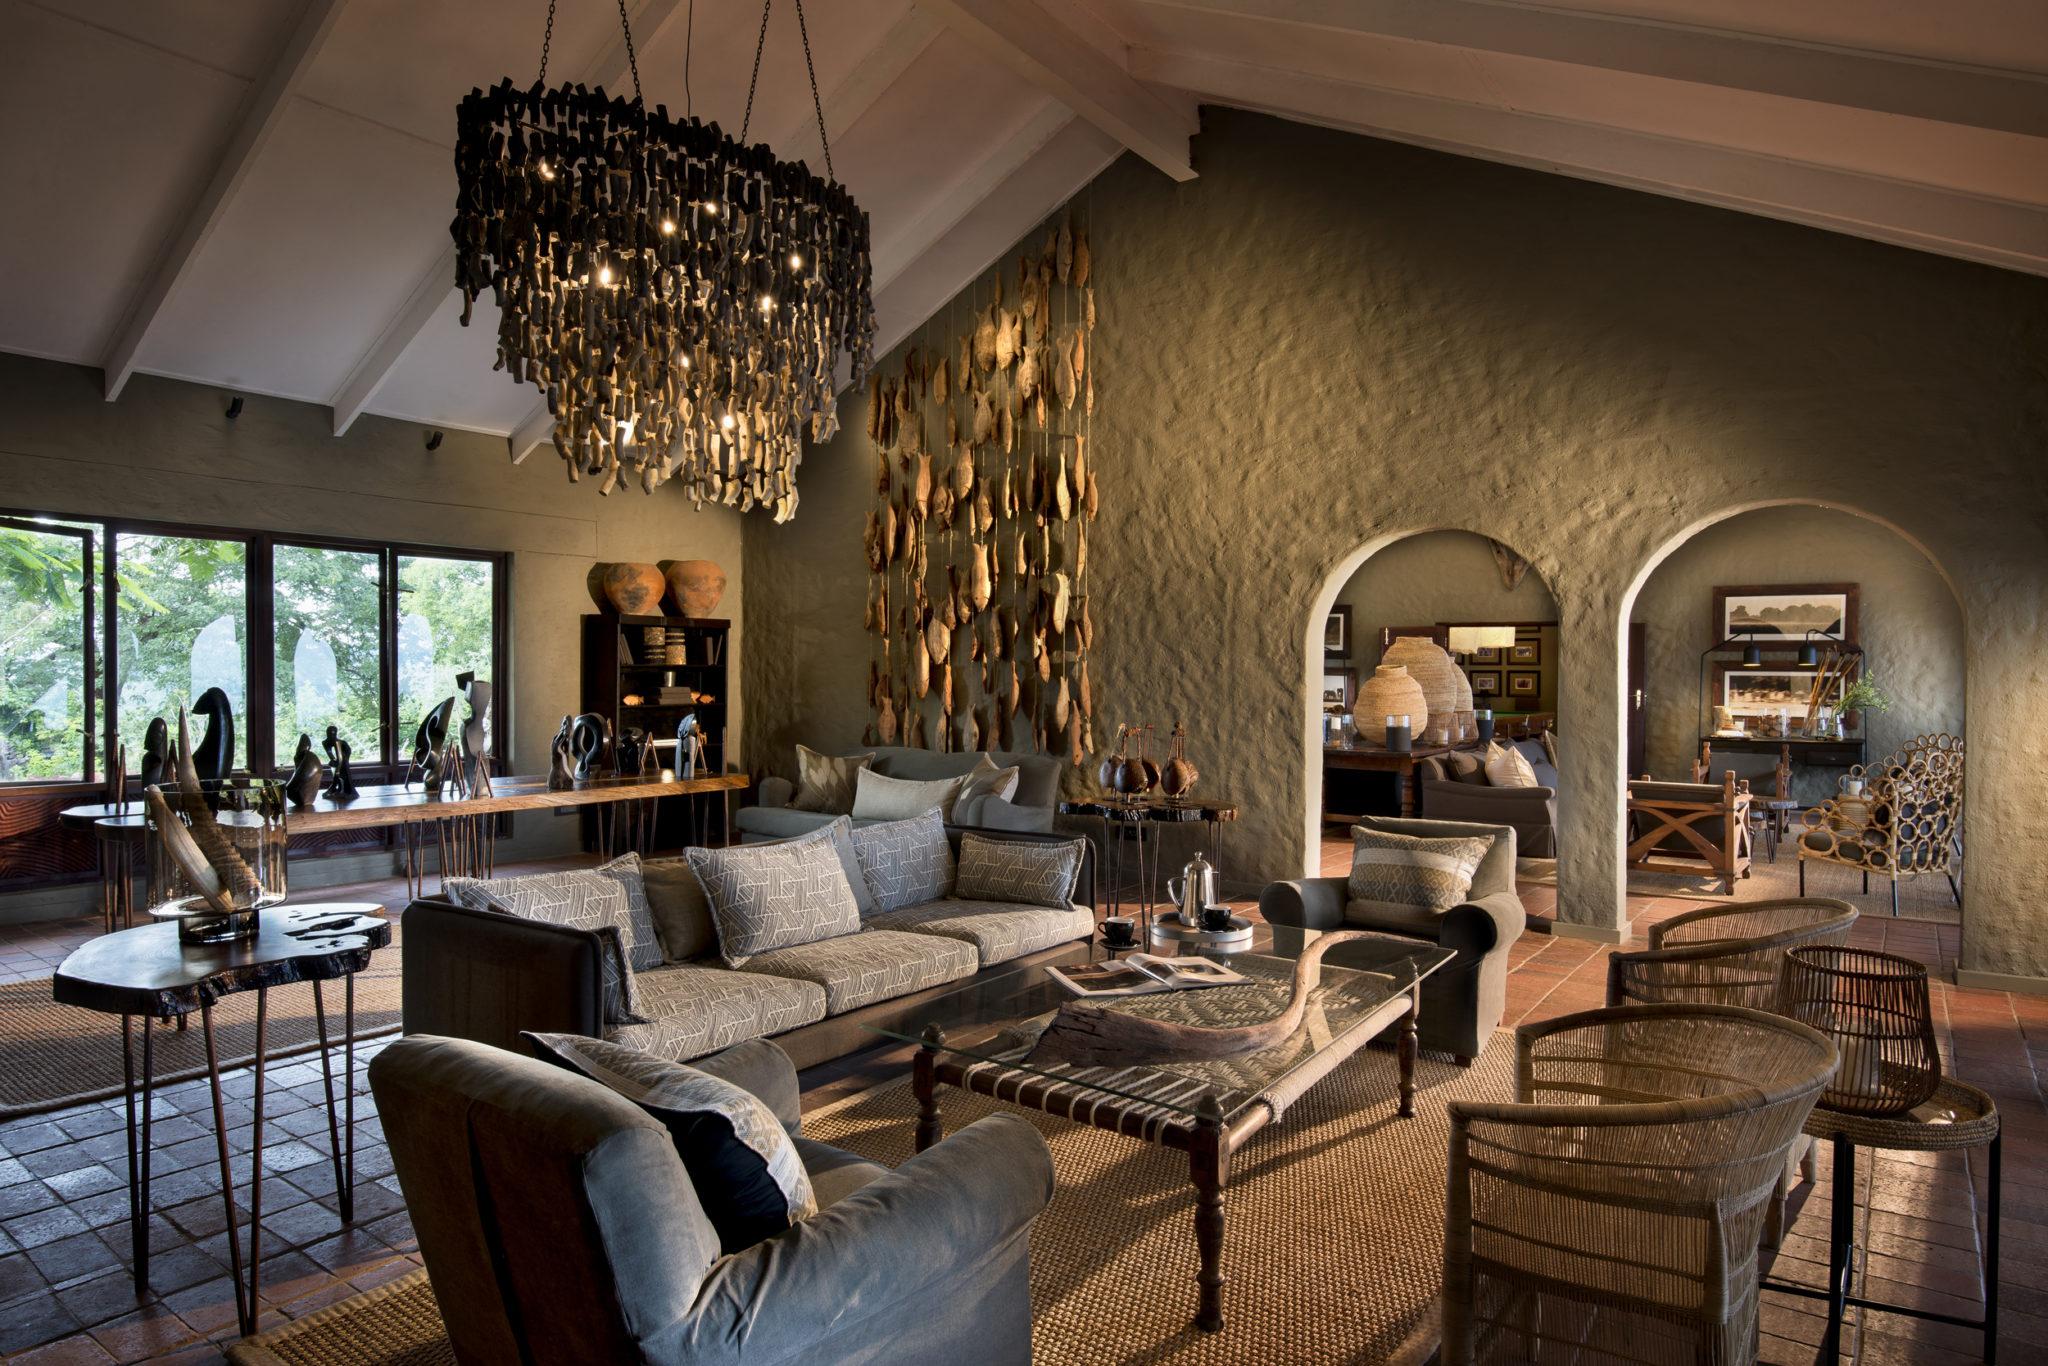 Bumi-Hills-Safari-Lodge_Lake-Kariba_Zimbabwe_Luxury-Safari-Lodge_-Main-Area_African-Bush-Camps-5.jpg